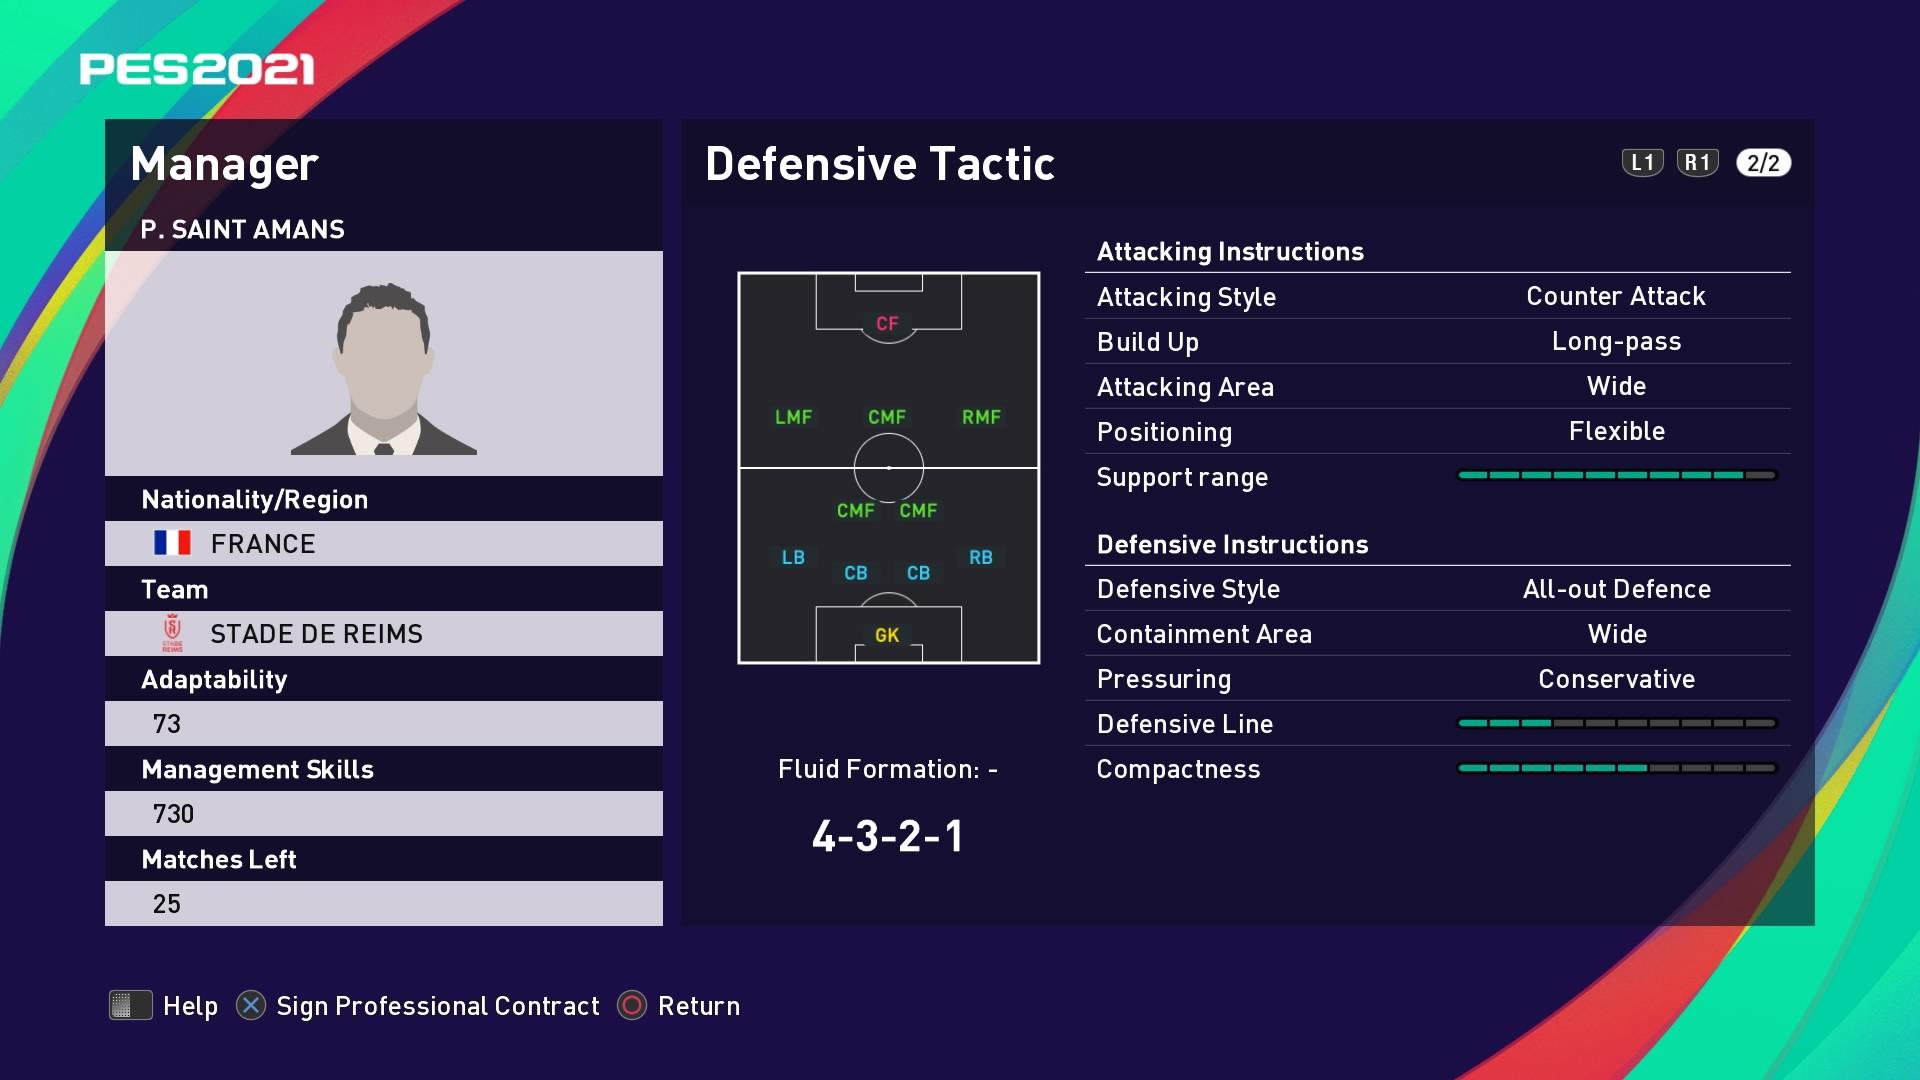 P. Saint Amans (David Guion) Defensive Tactic in PES 2021 myClub